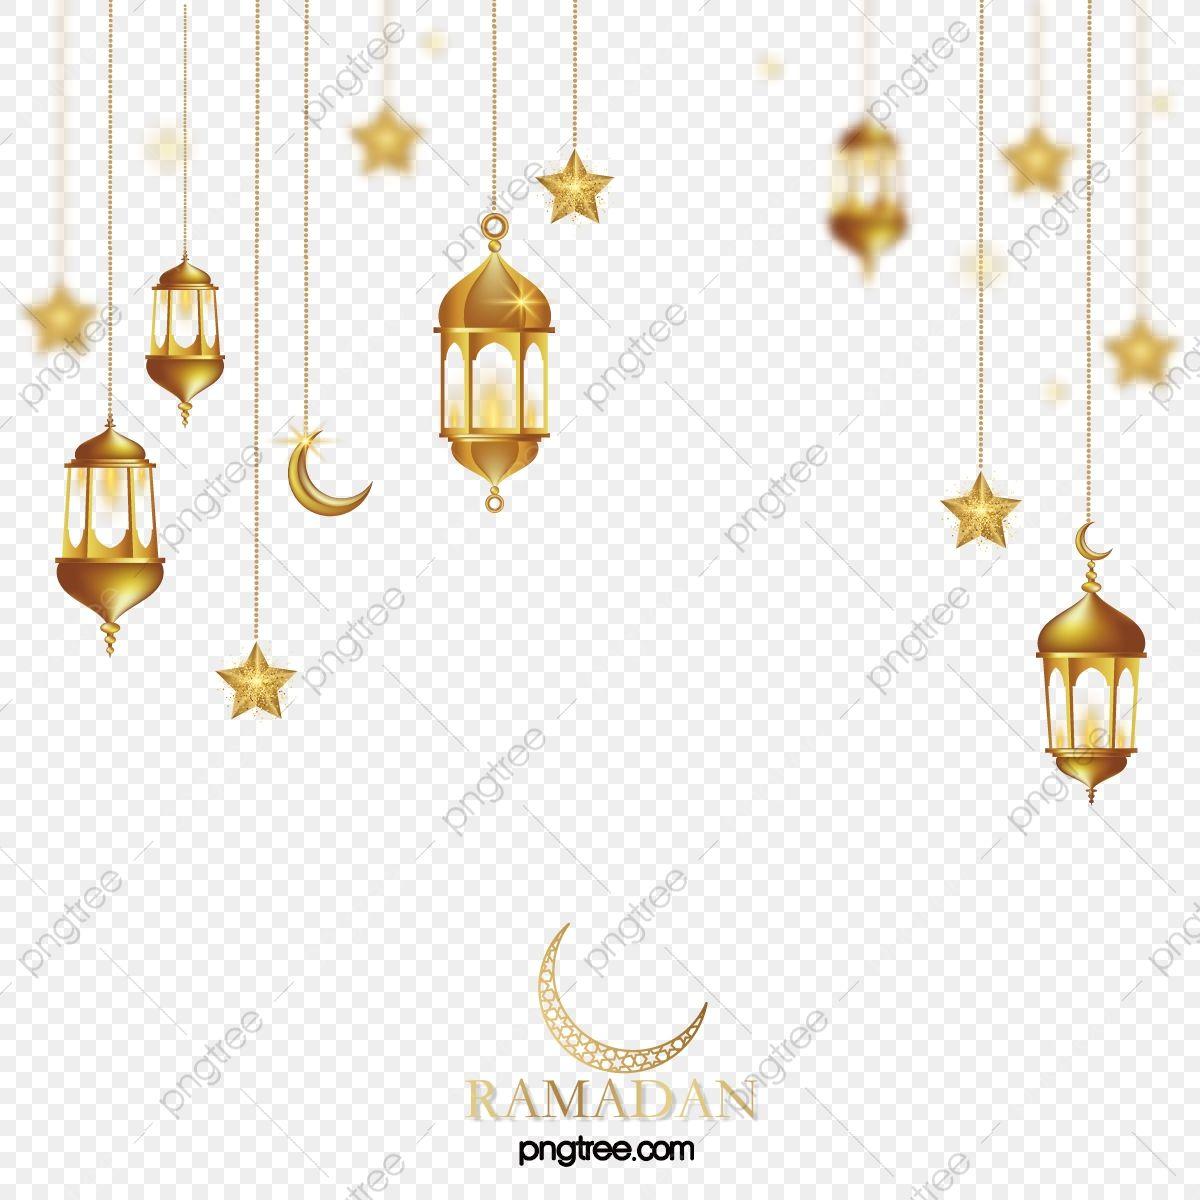 Three Dimensional Golden Ramadan Lantern Stars Moon Hanging Ramadan Moon Muslim Png And Vector With Transparent Background For Free Download En 2020 Clipart Lampe Lanterne Lanterne